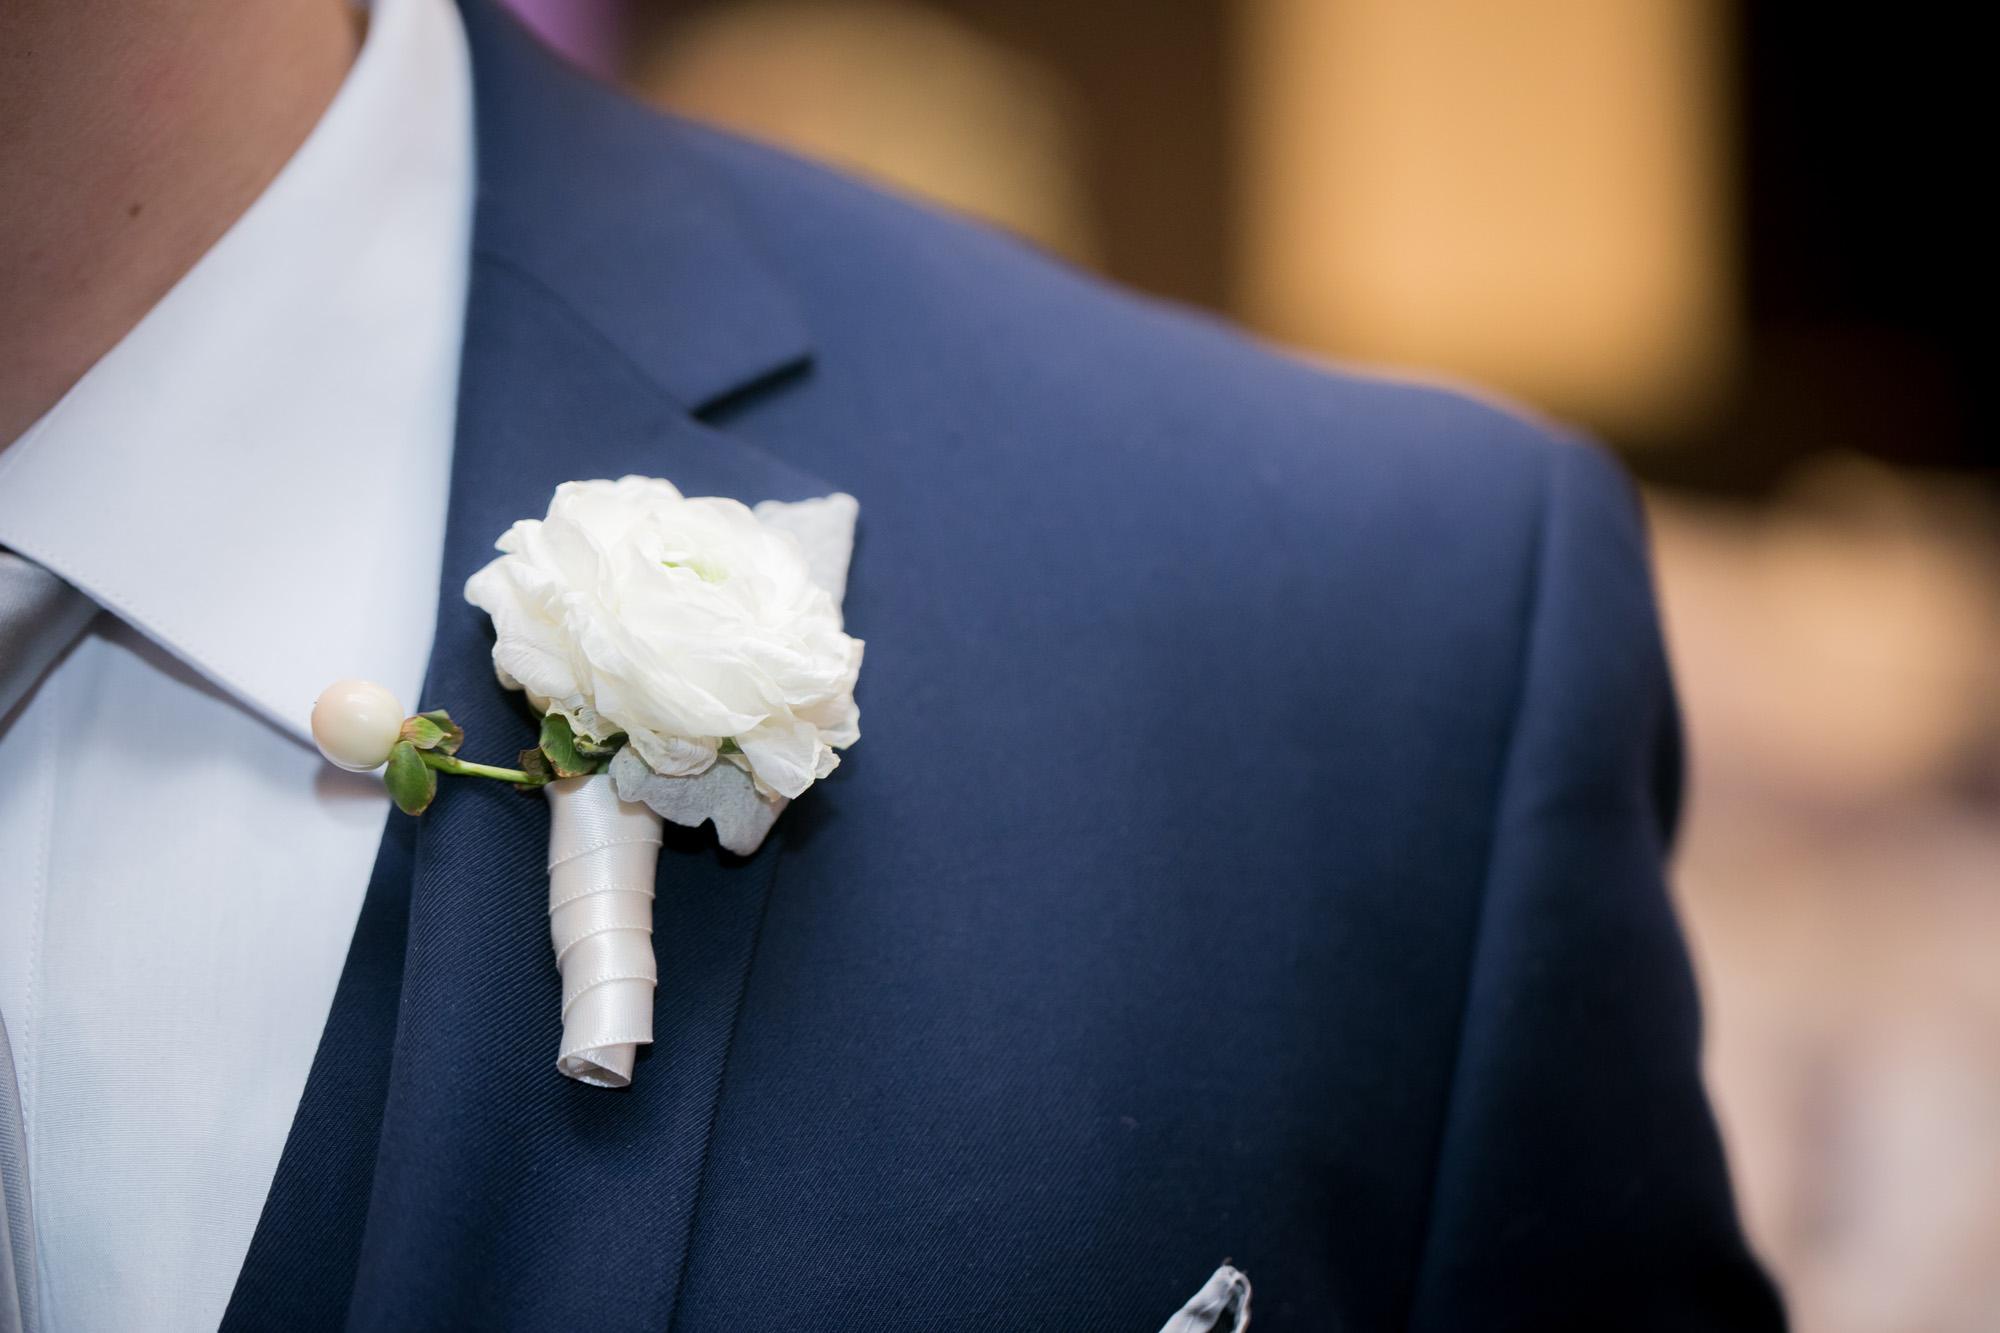 Geoff Kowalchuk JT Wedding Photo-021.jpg